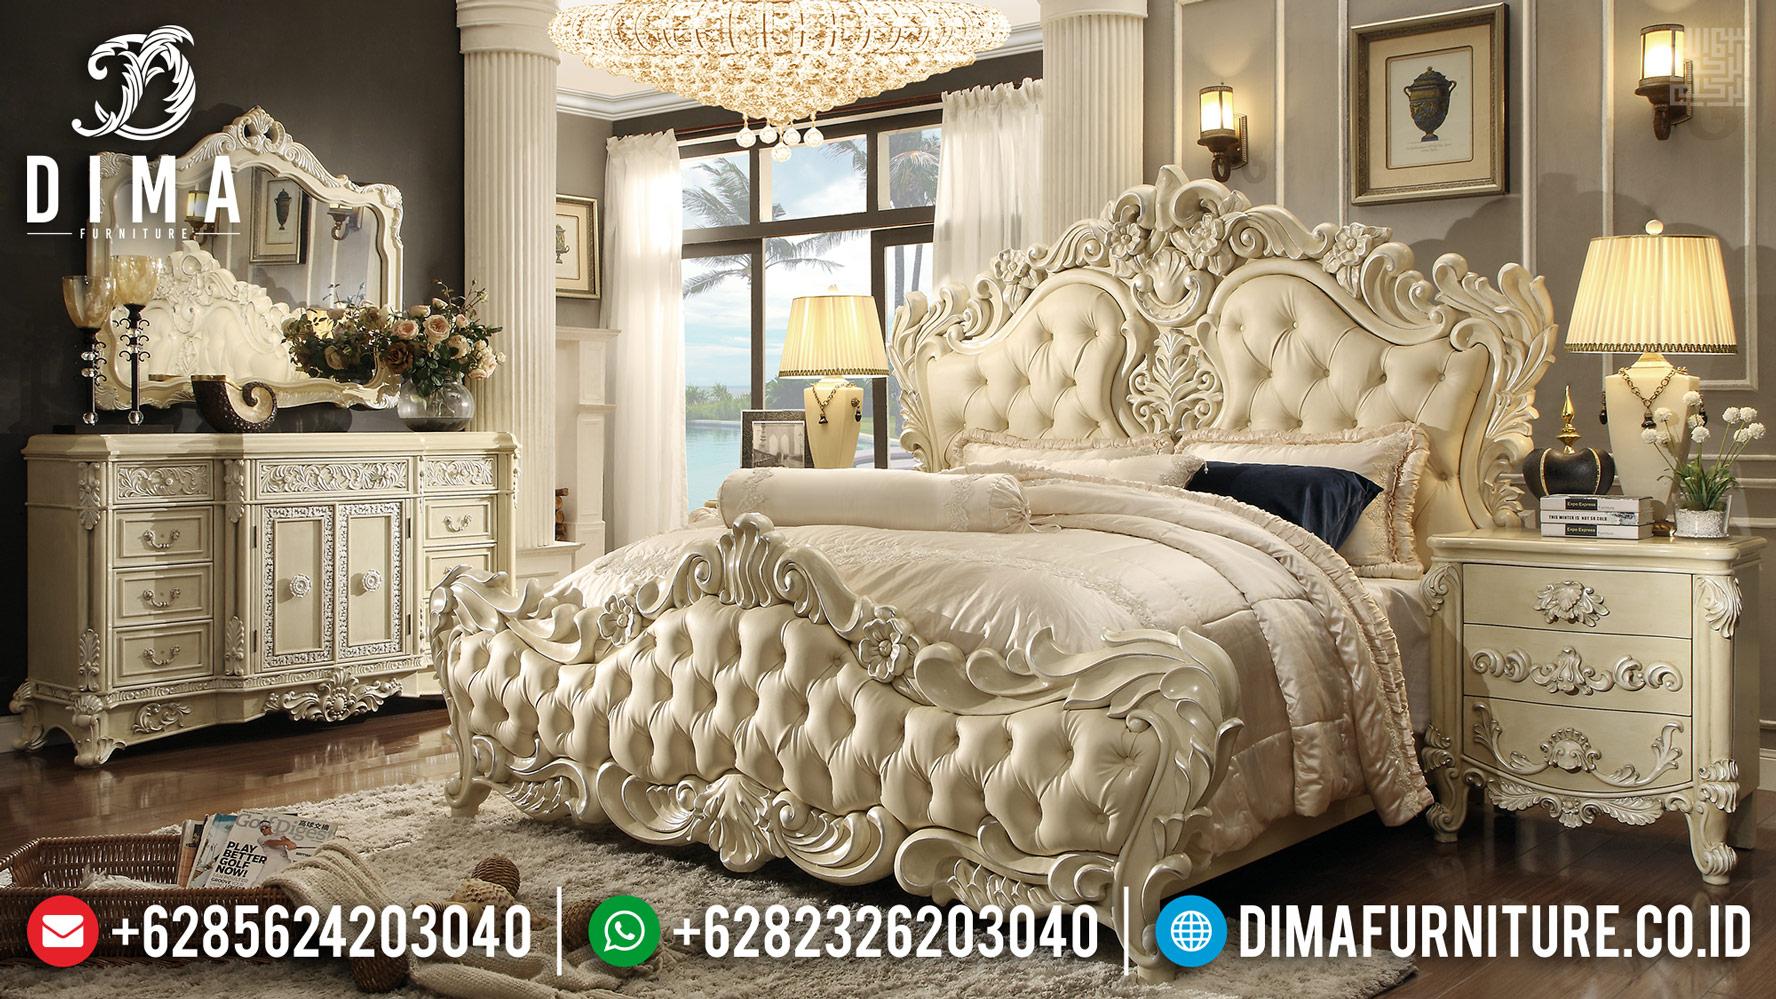 Set Tempat Tidur Mewah Jati Ukiran Classic Furniture Jepara Luxury TTJ-0417